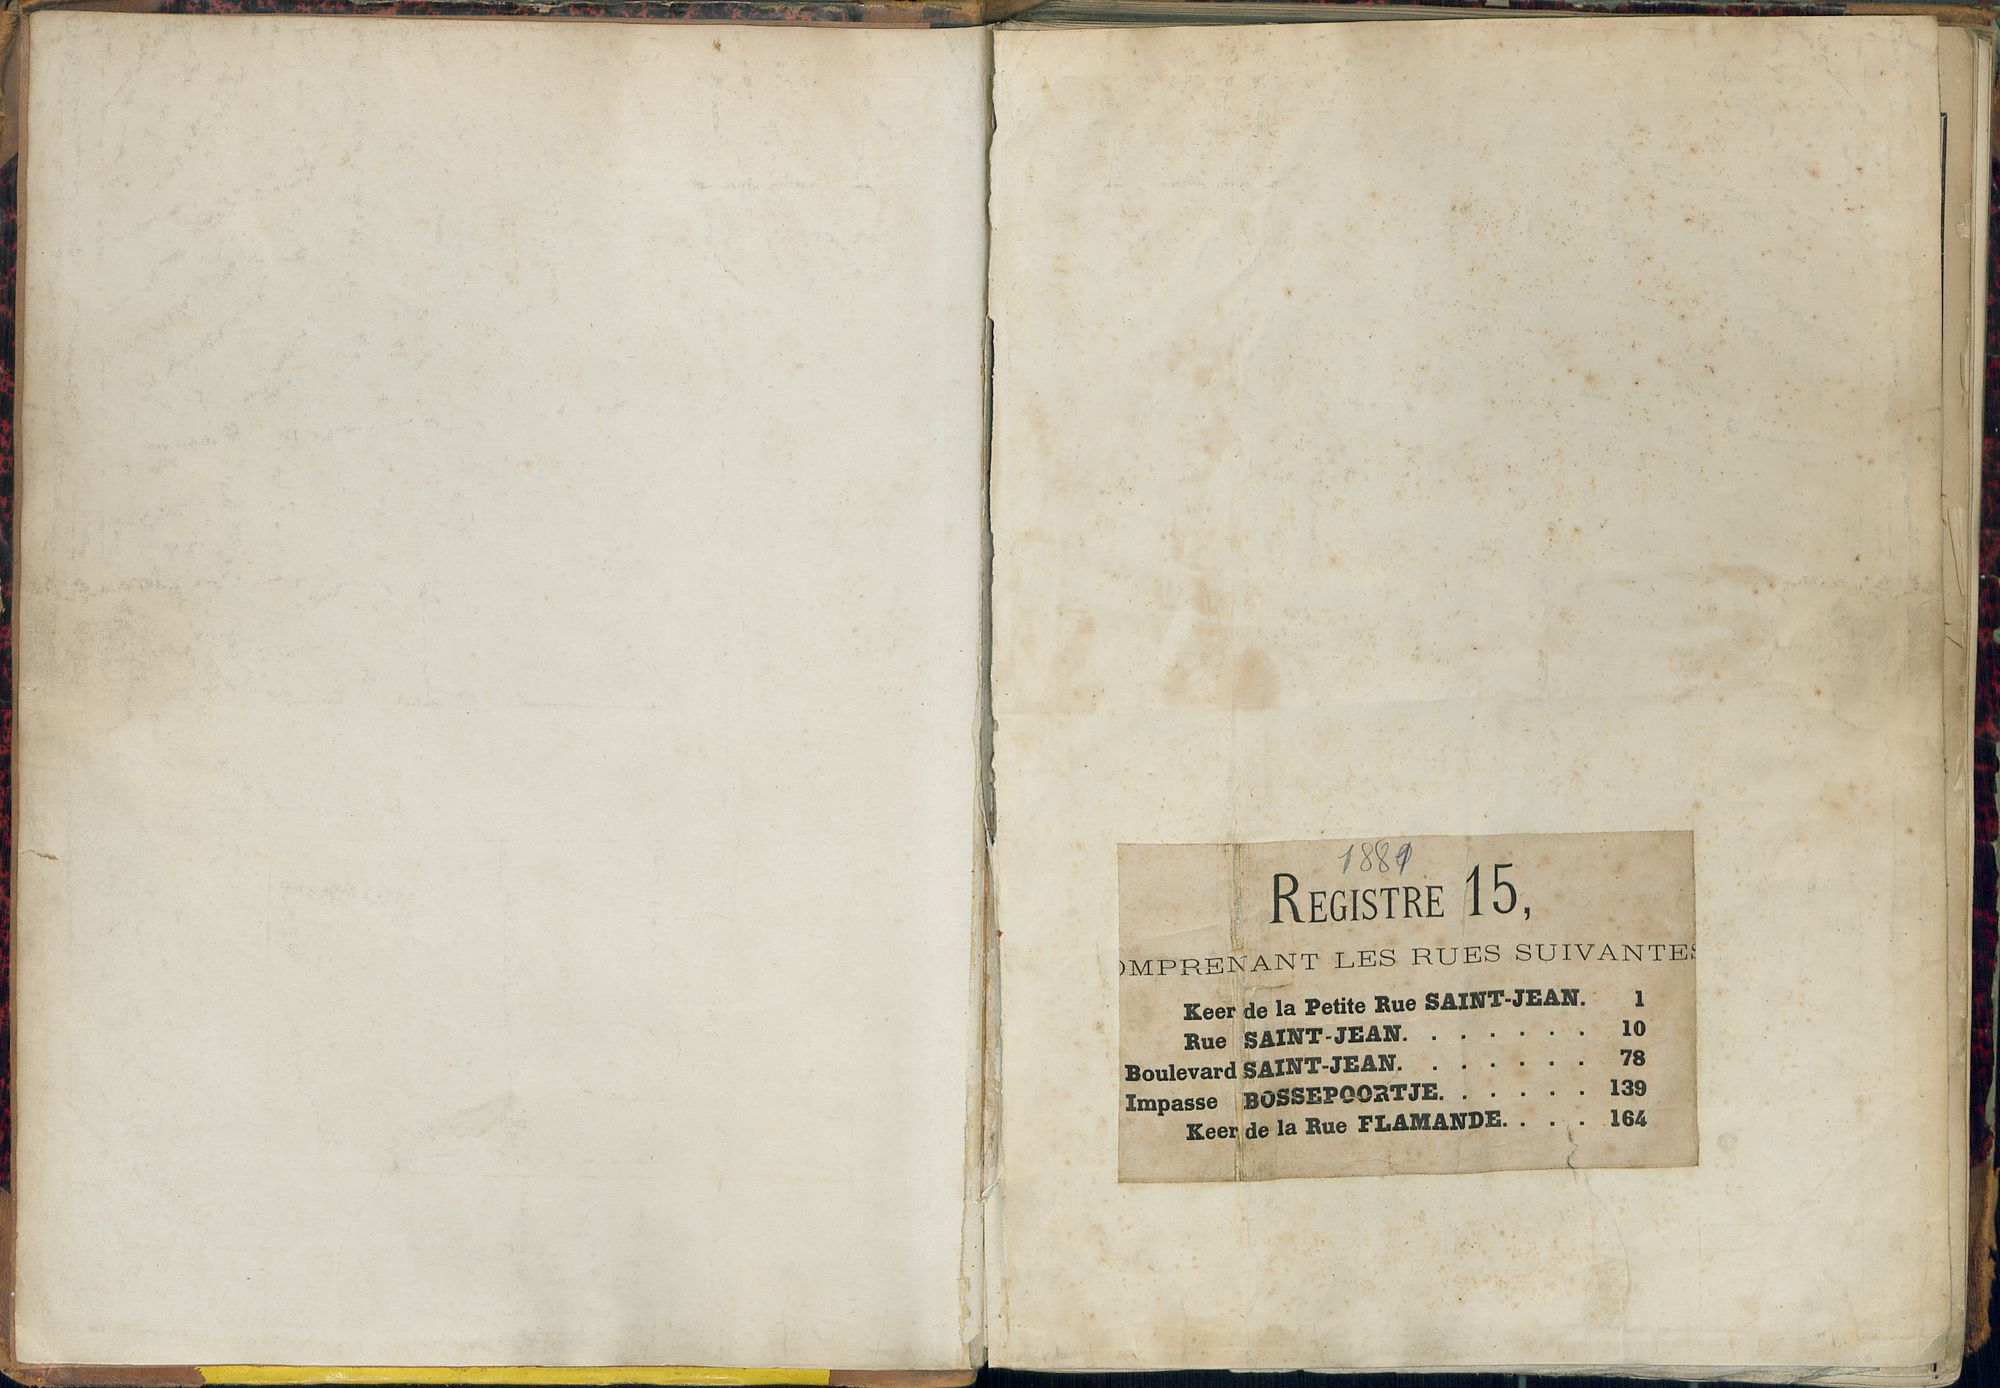 Bevolkingsregister Kortrijk 1880 boek 15